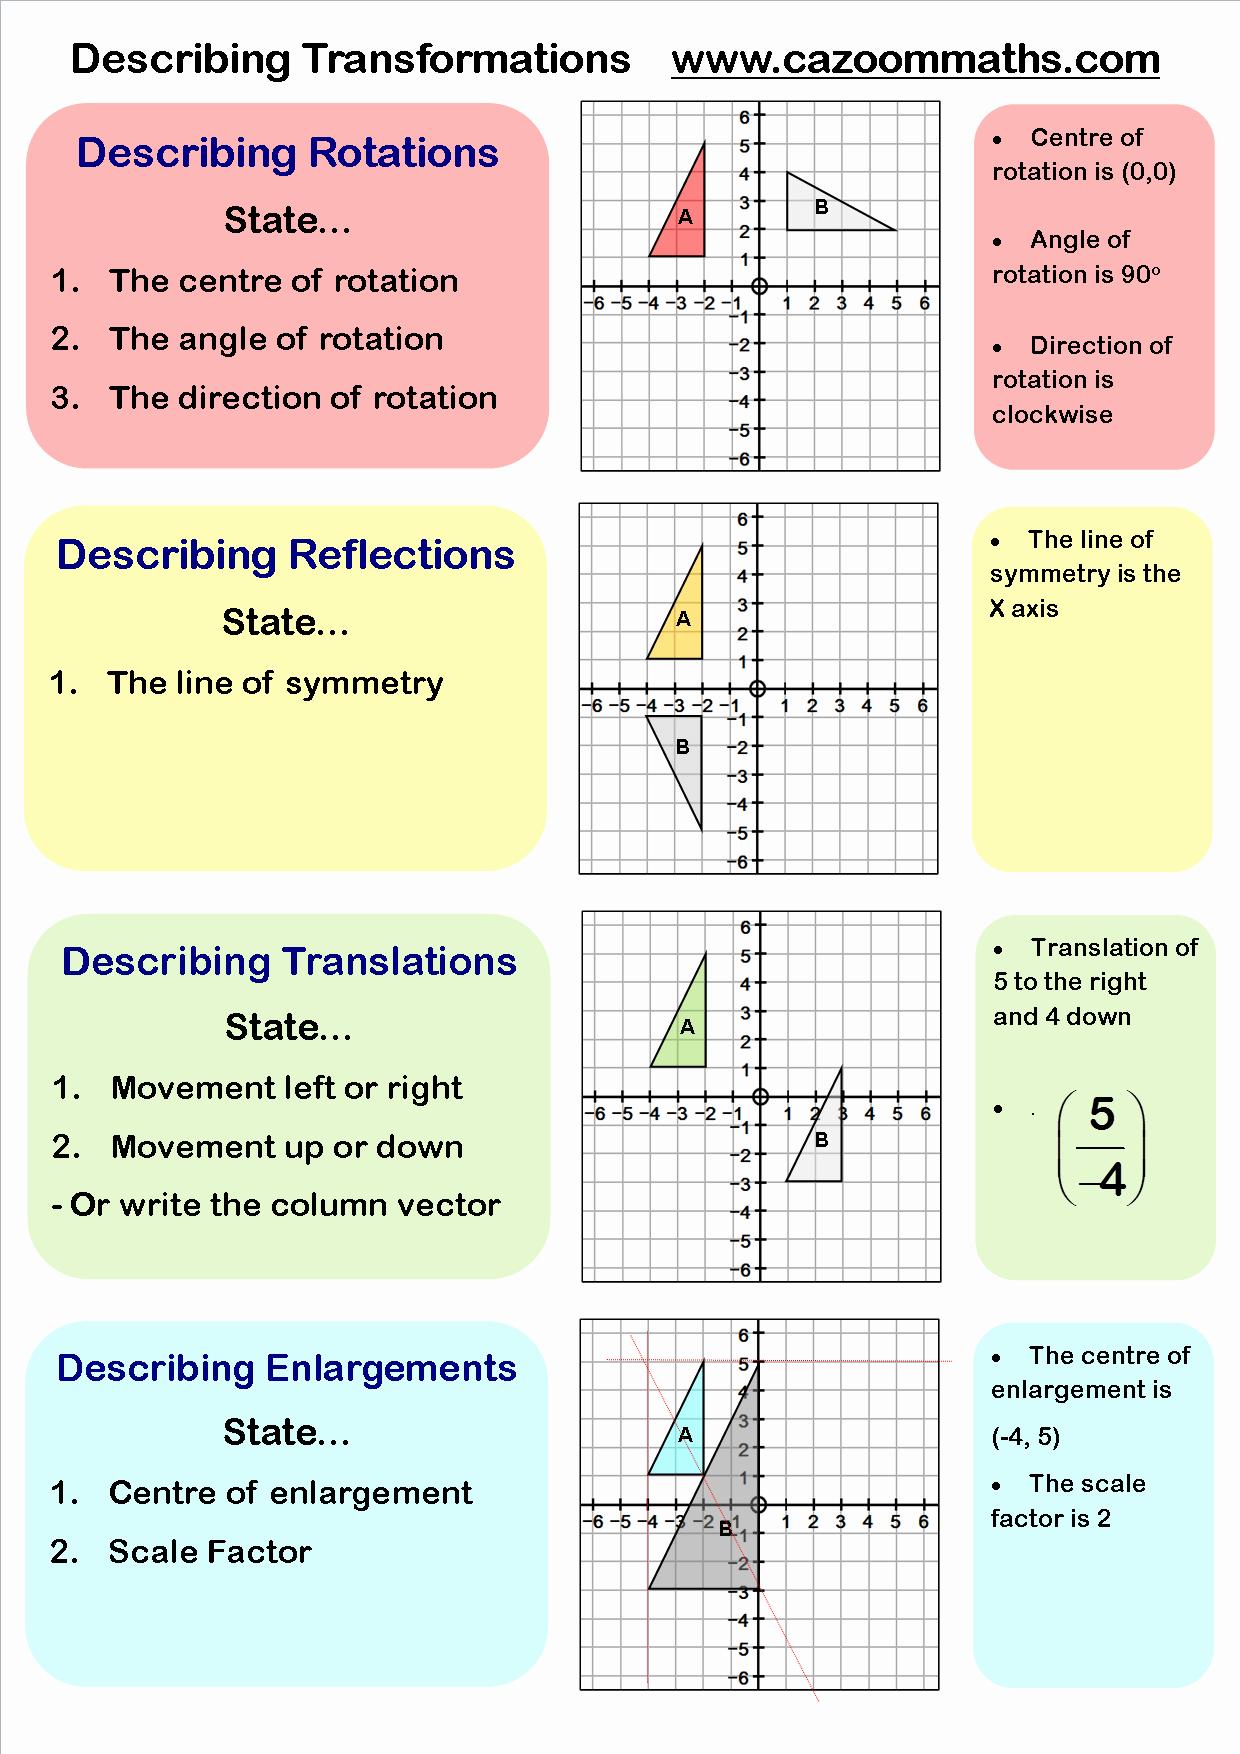 Geometry Transformations Worksheet Pdf Elegant Cazoom Maths Worksheets Maths Worksheets